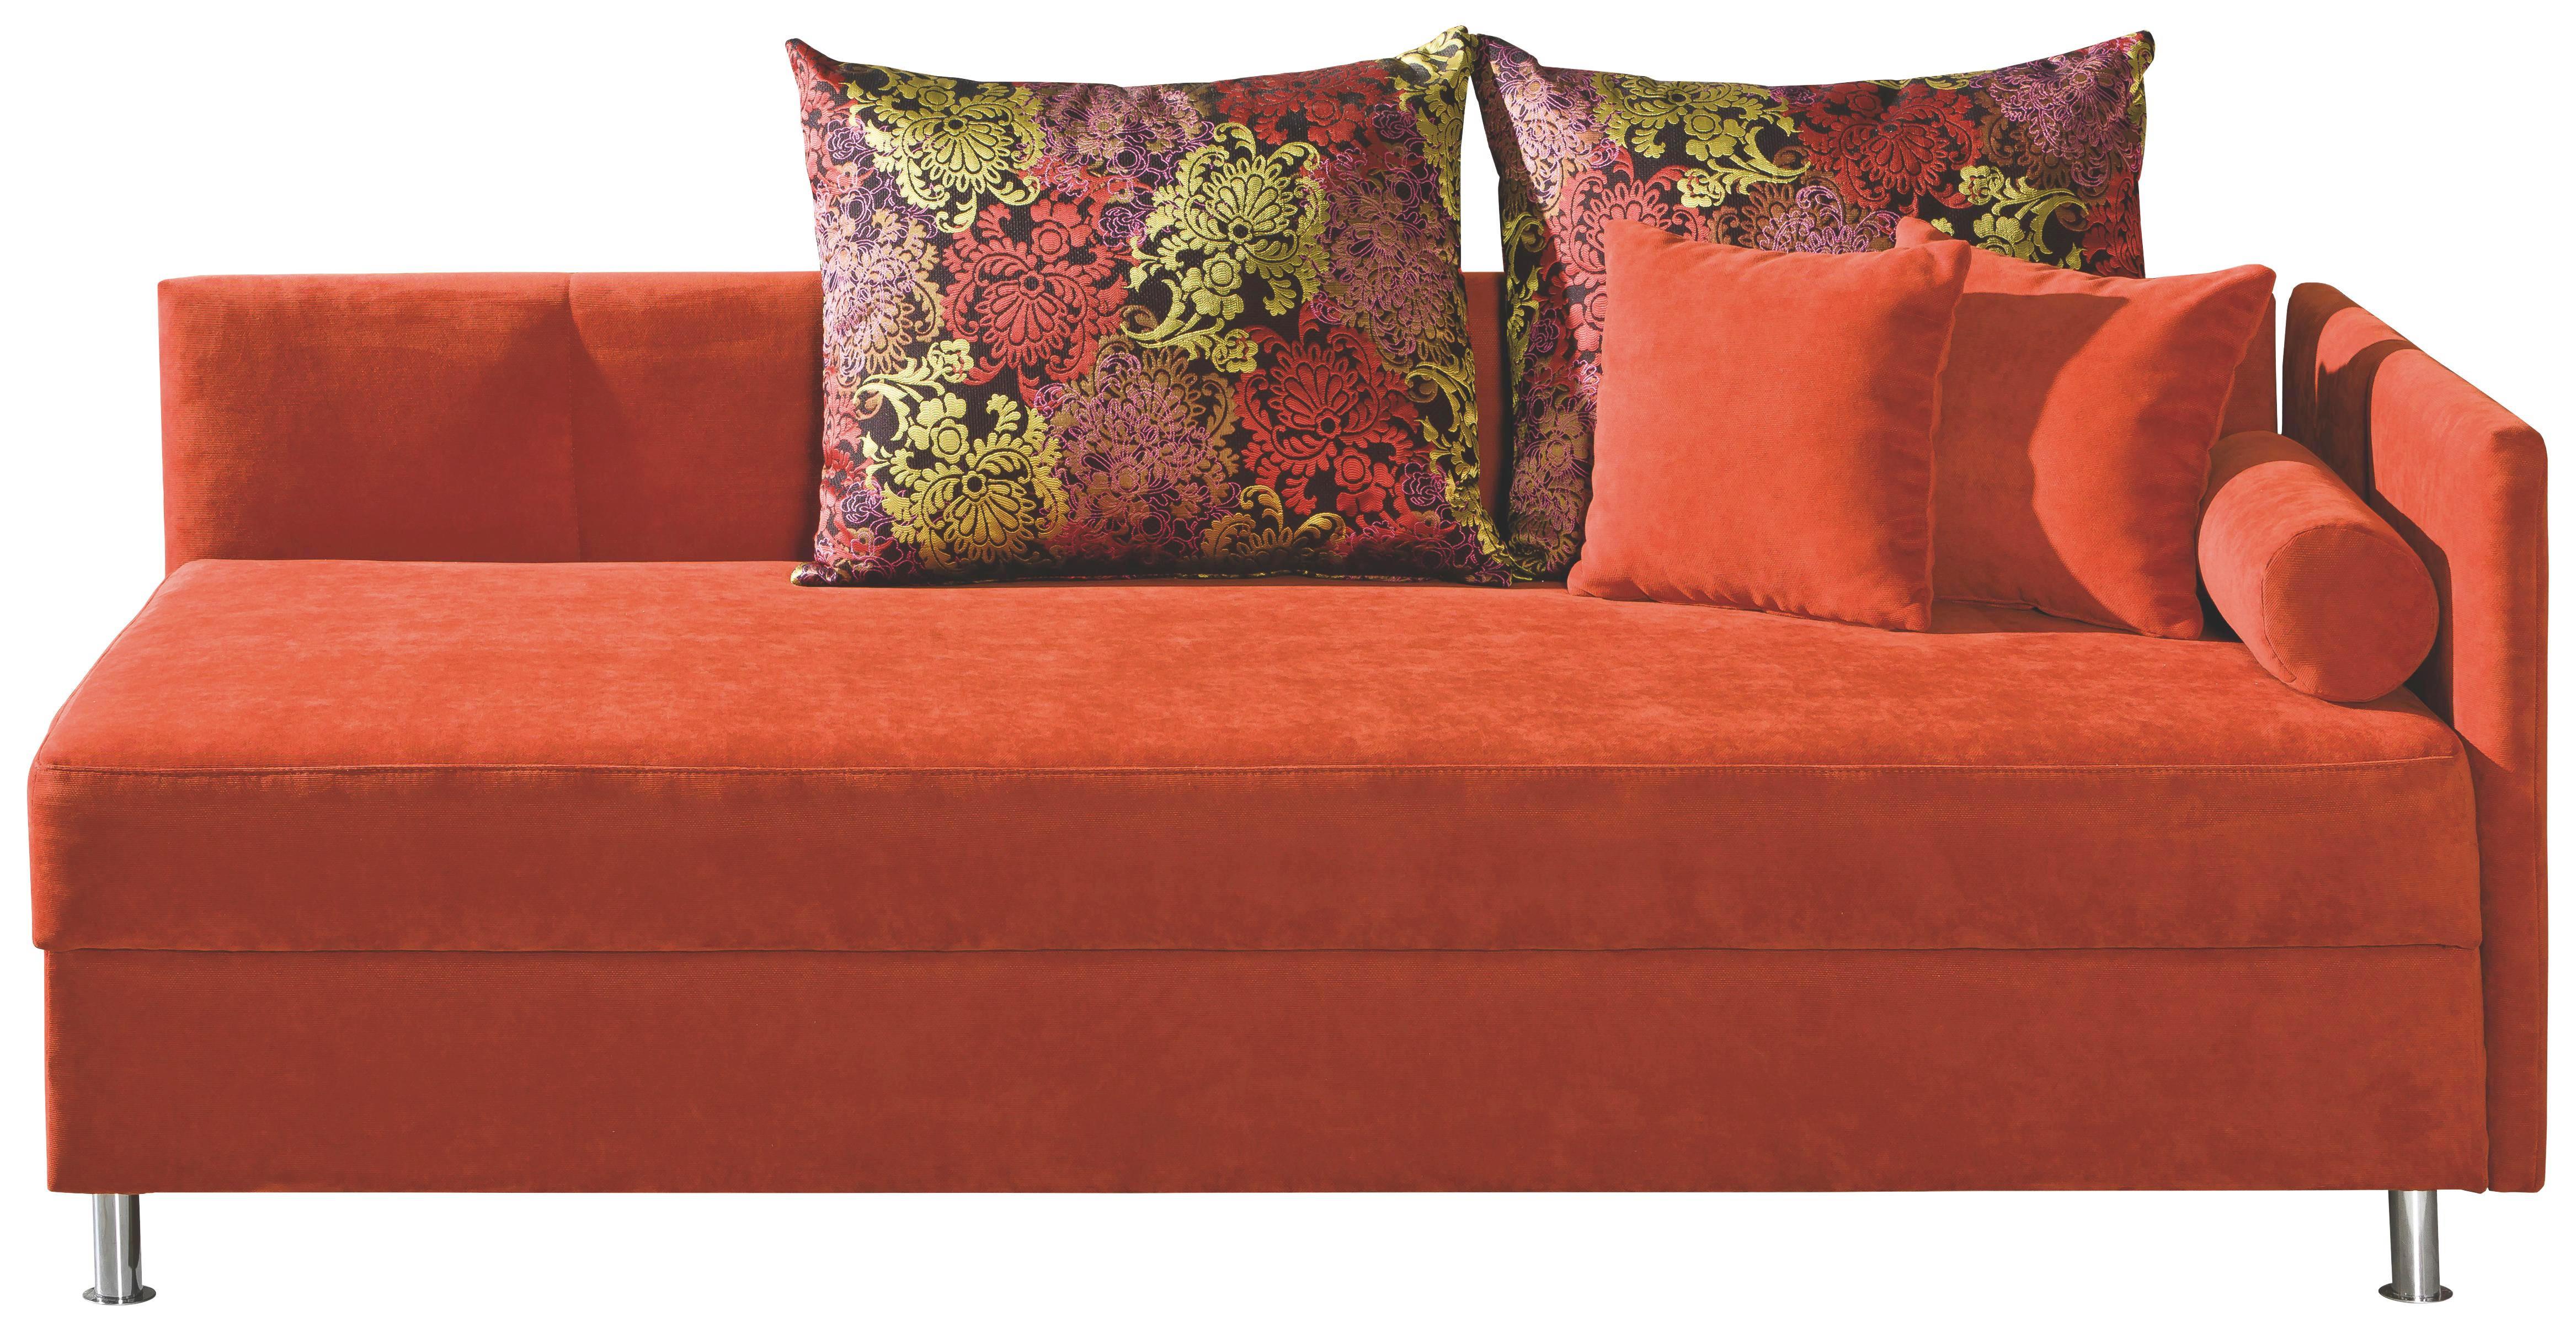 LIEGE Terra cotta - Chromfarben/Terra cotta, KONVENTIONELL, Textil/Metall (200/48/90cm) - NOVEL